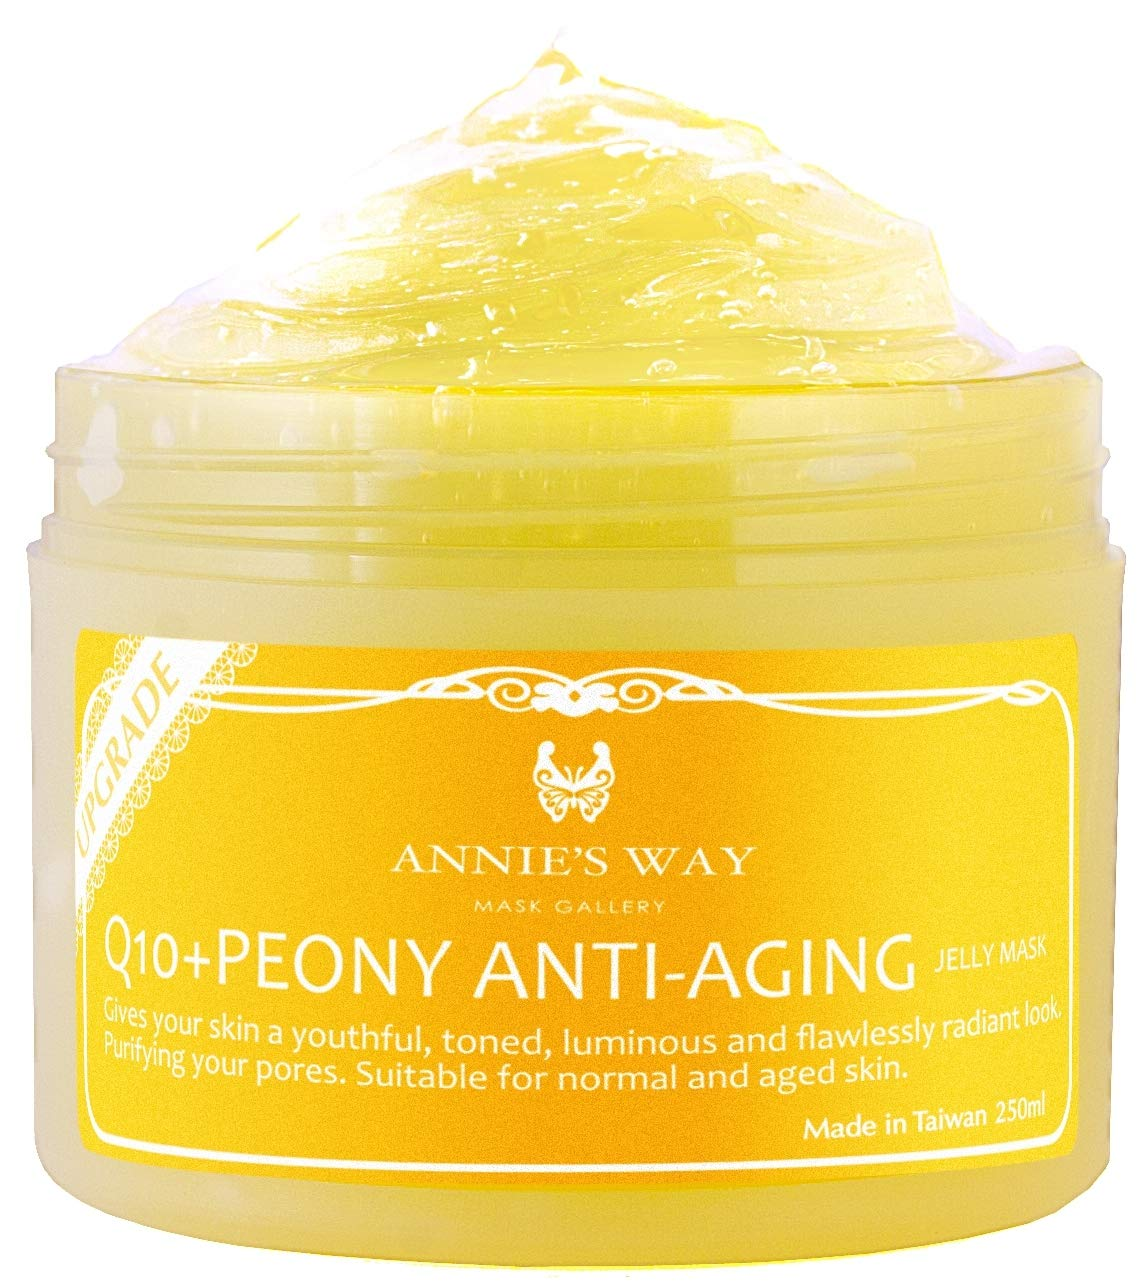 ANNIE'S WAY [Upgraded] Jelly Mask 250ml/8oz Q10+Peony Anti-Aging Jelly Mask